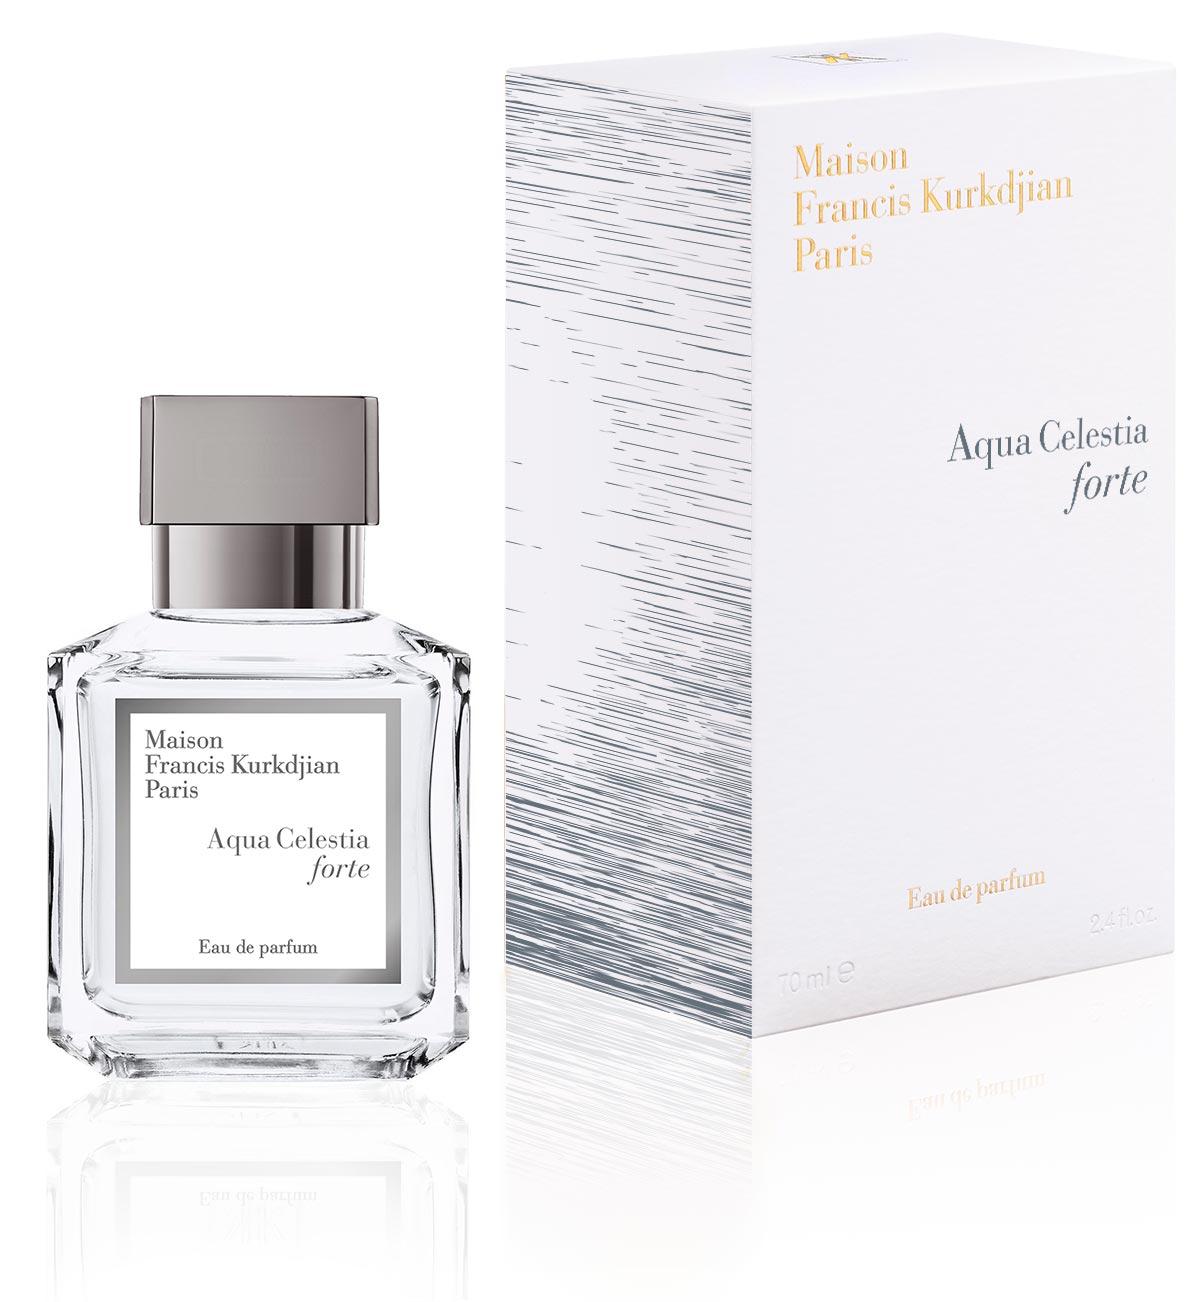 Maison Francis Kurkdjian Presents Aqua Celestia Forte